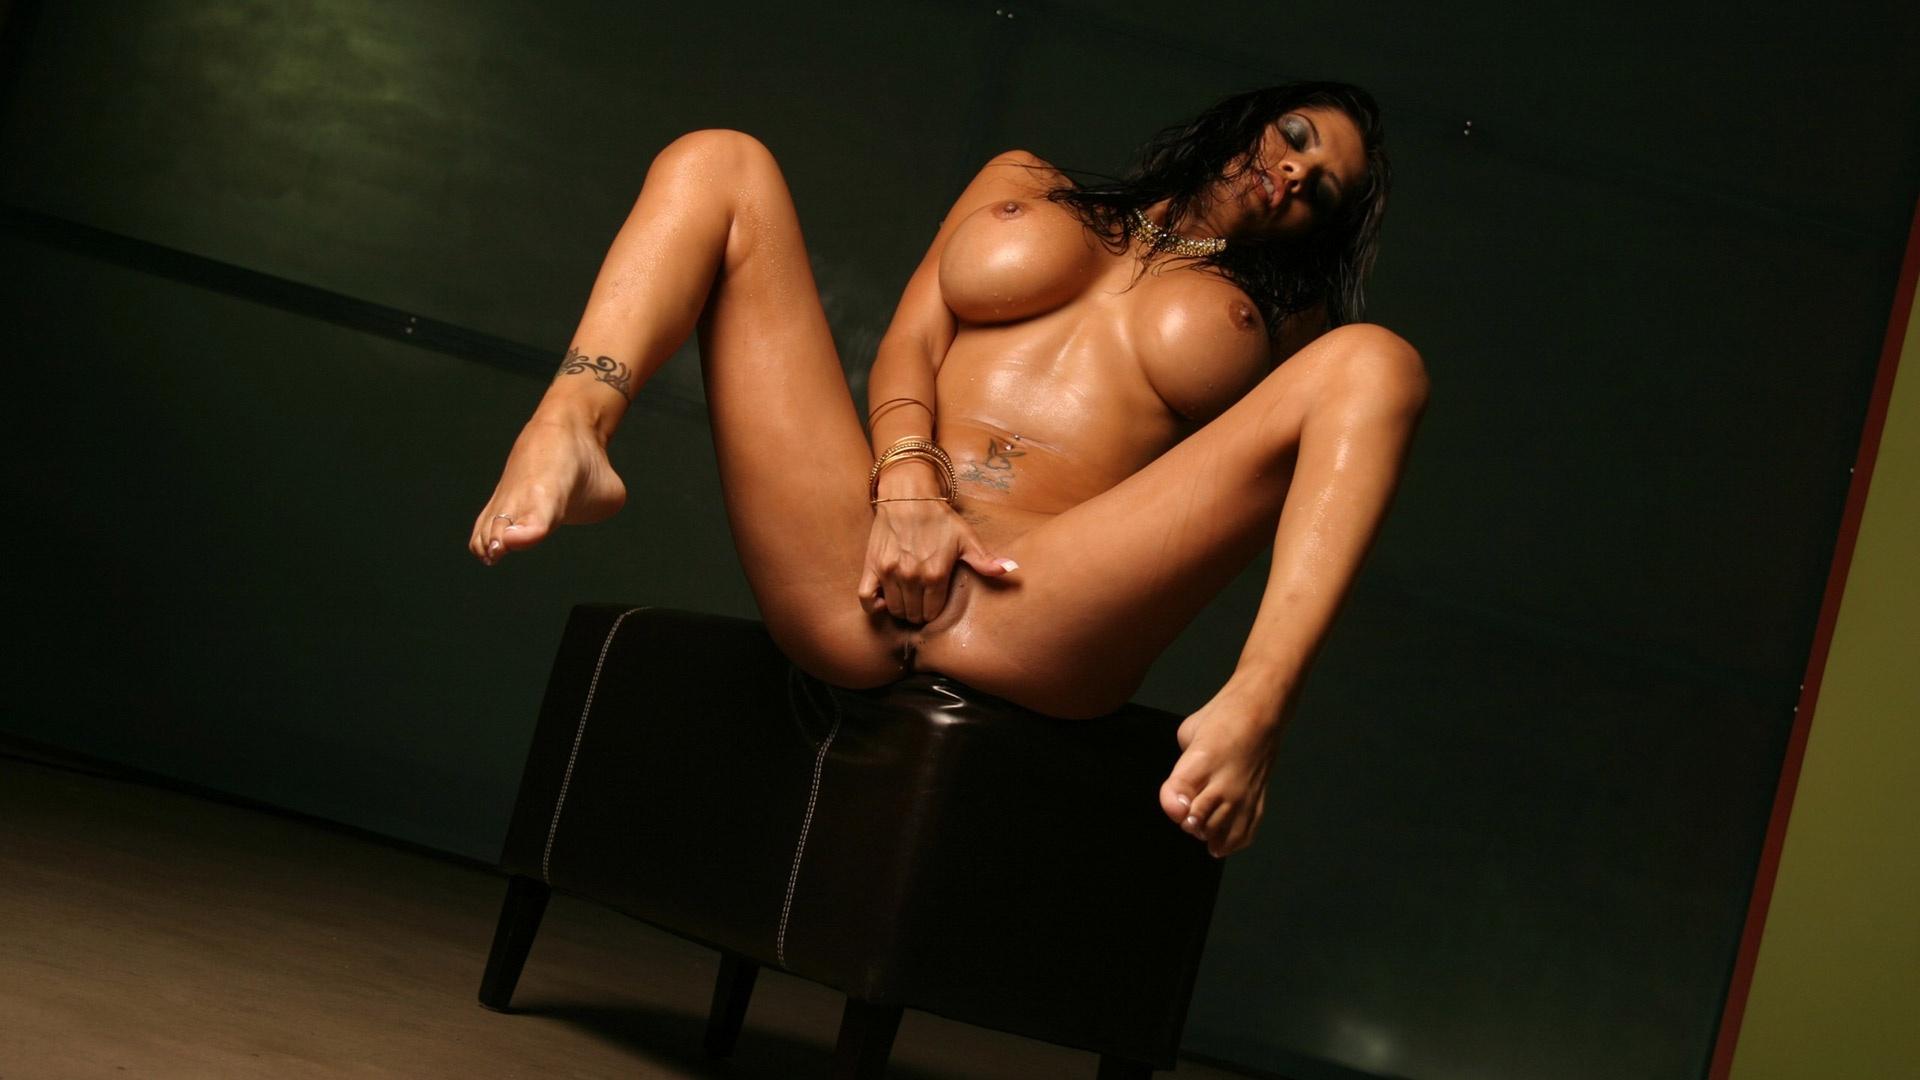 alexis amore masturbating in her deep vagina fisting adult